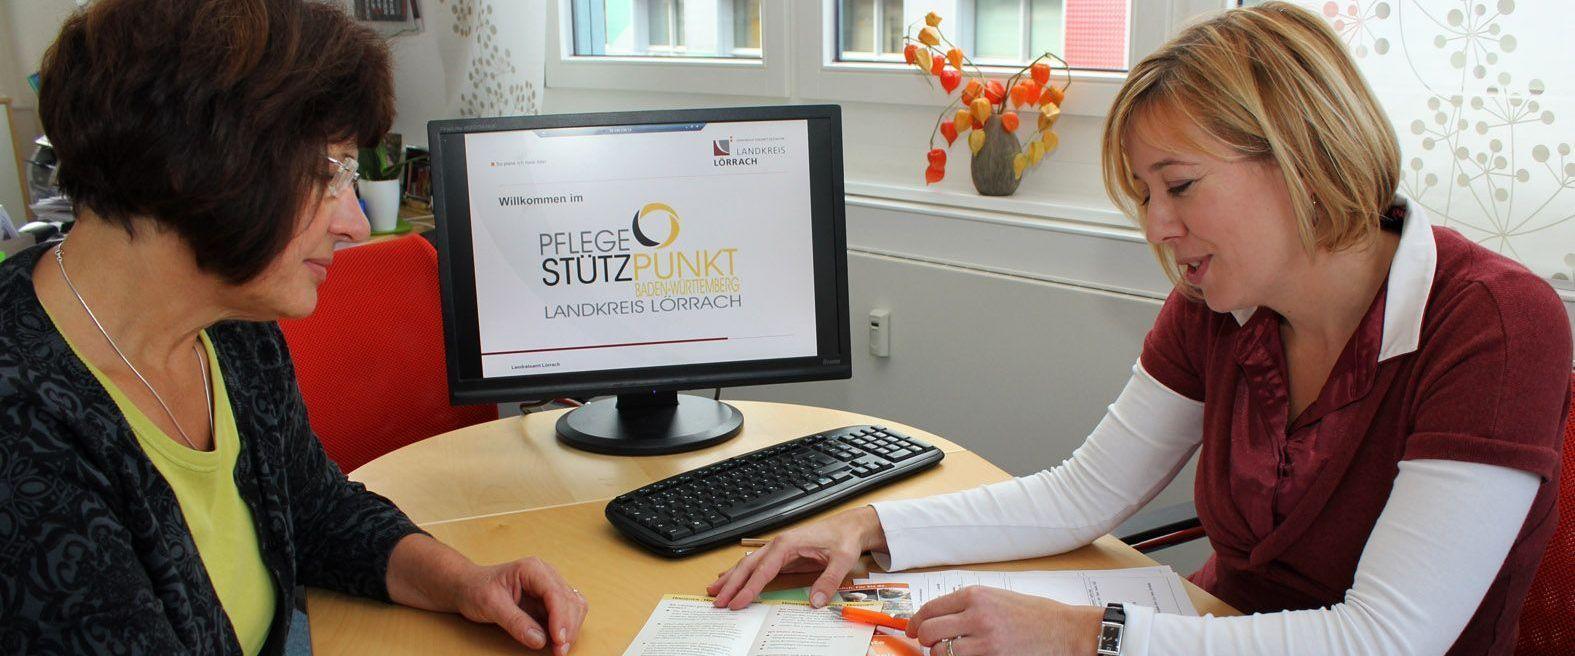 Beratung im Pflegestützpunkt Landkreis Lörrach